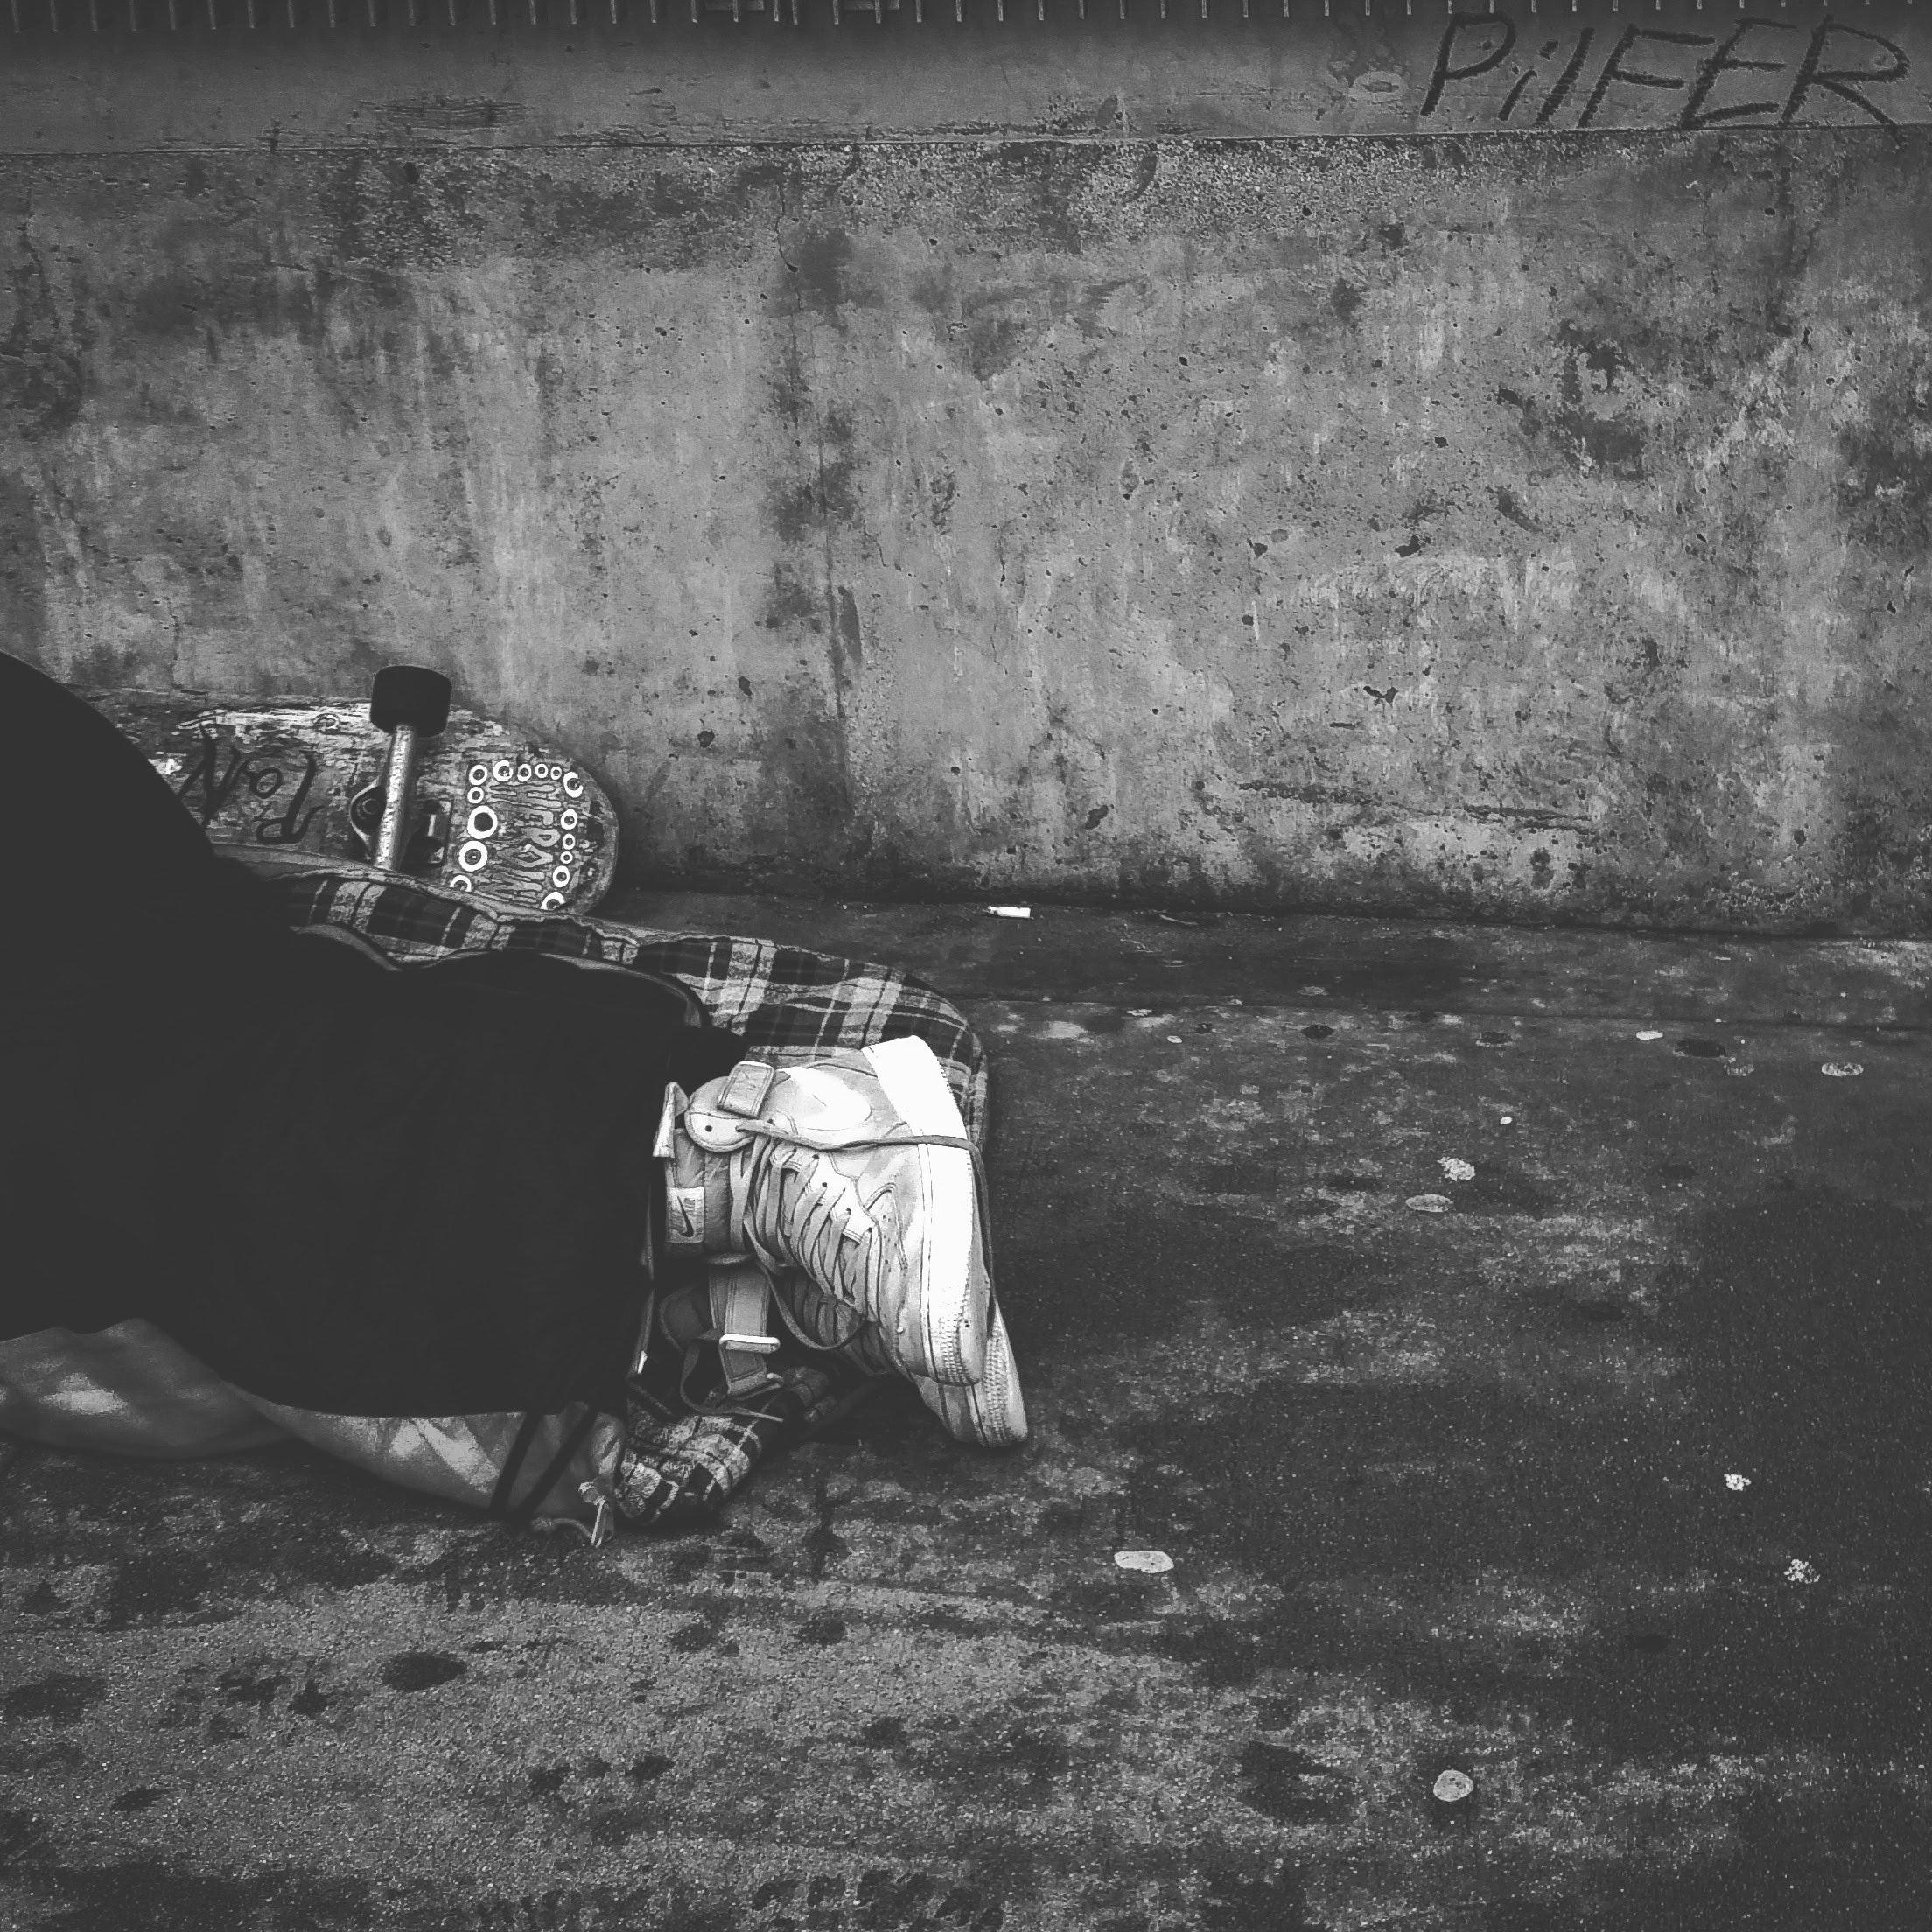 abandoned-adult-black-and-white-384553.jpg